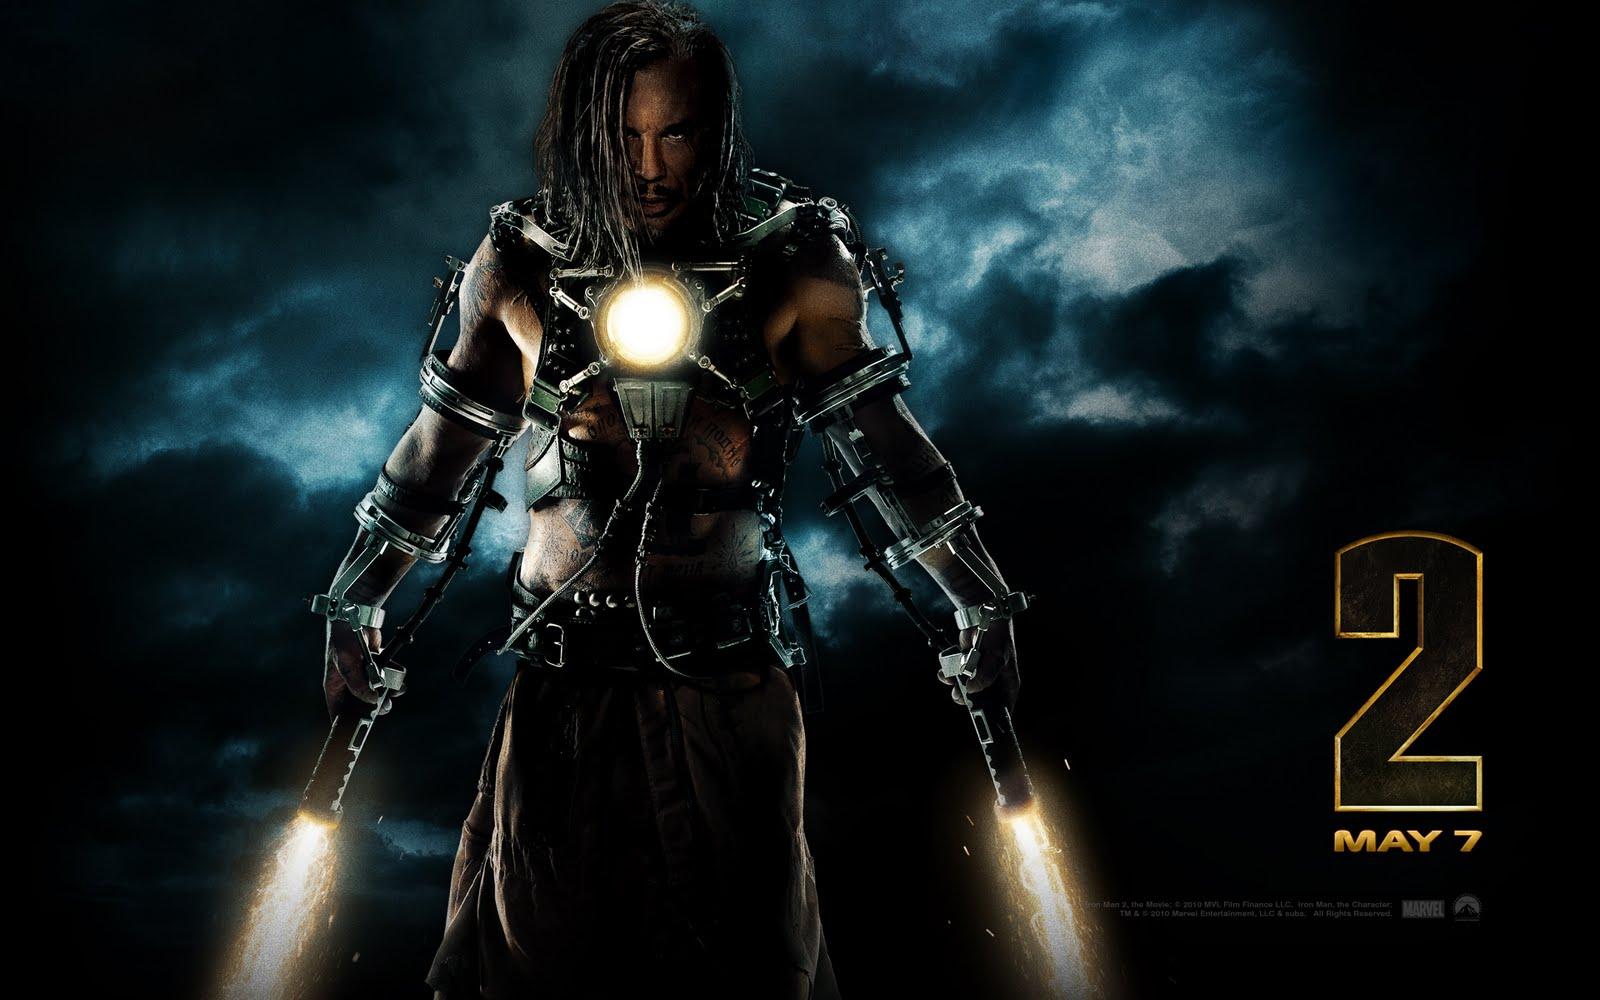 Iron Man 2 Wallpaper Film Kino Trailer 1600x1000